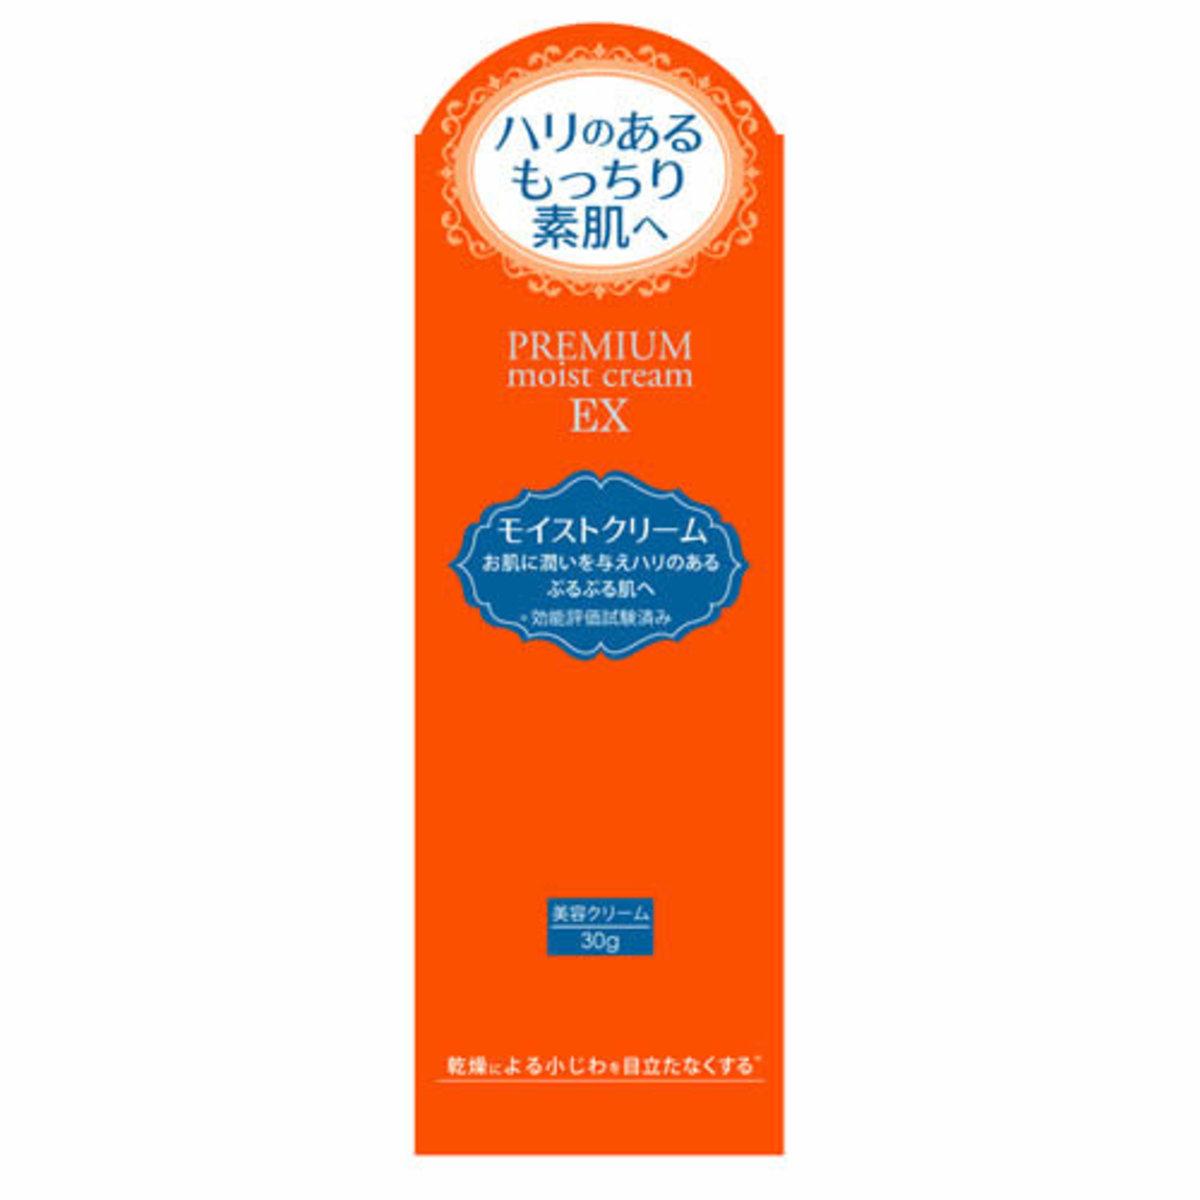 (Orange) Made in Japan Premium Moist Cream EX (for Skin around Eyes and Lips)